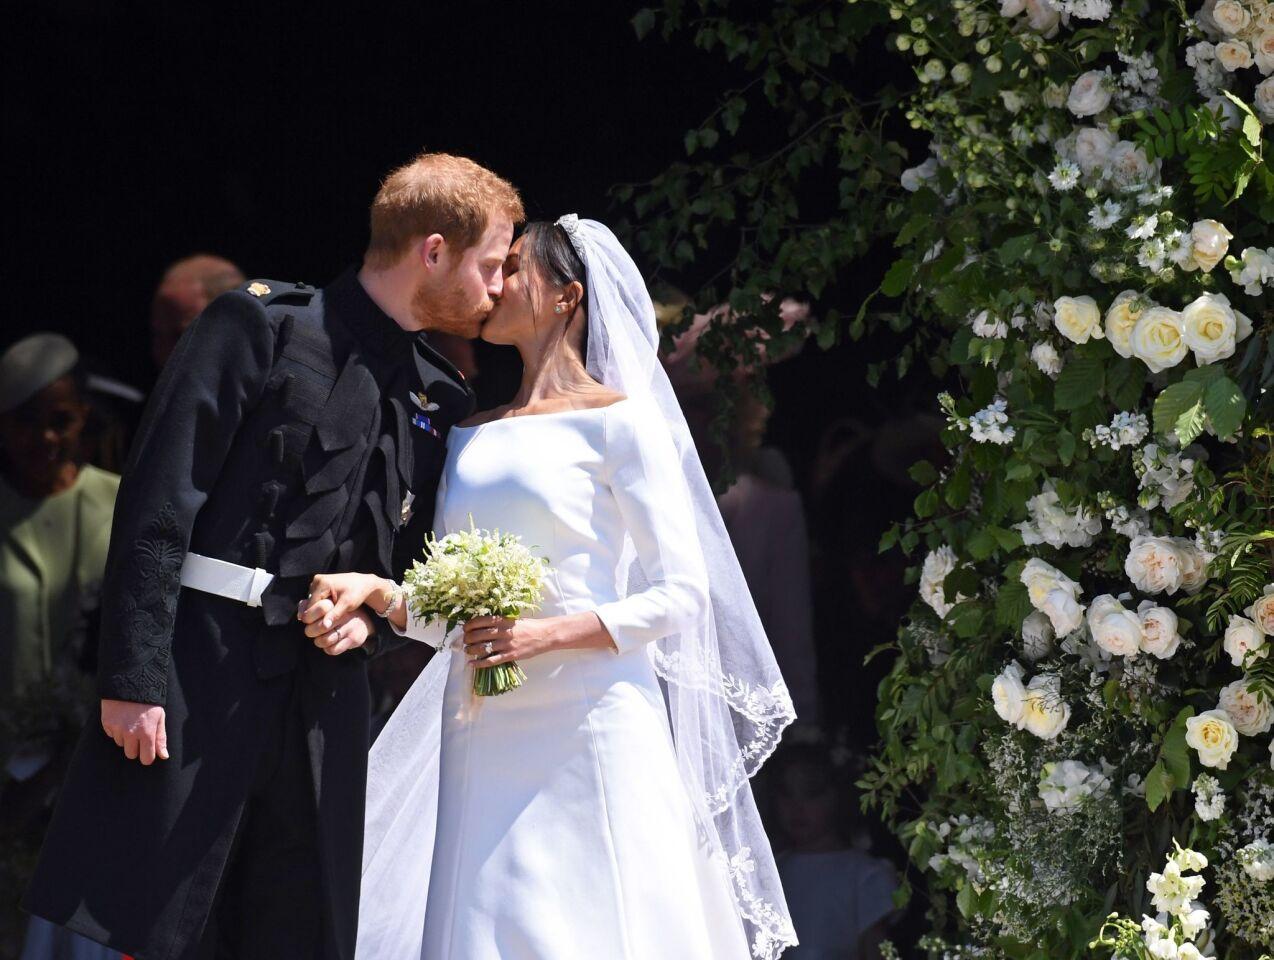 Prince Harry & Meghan Markle get married